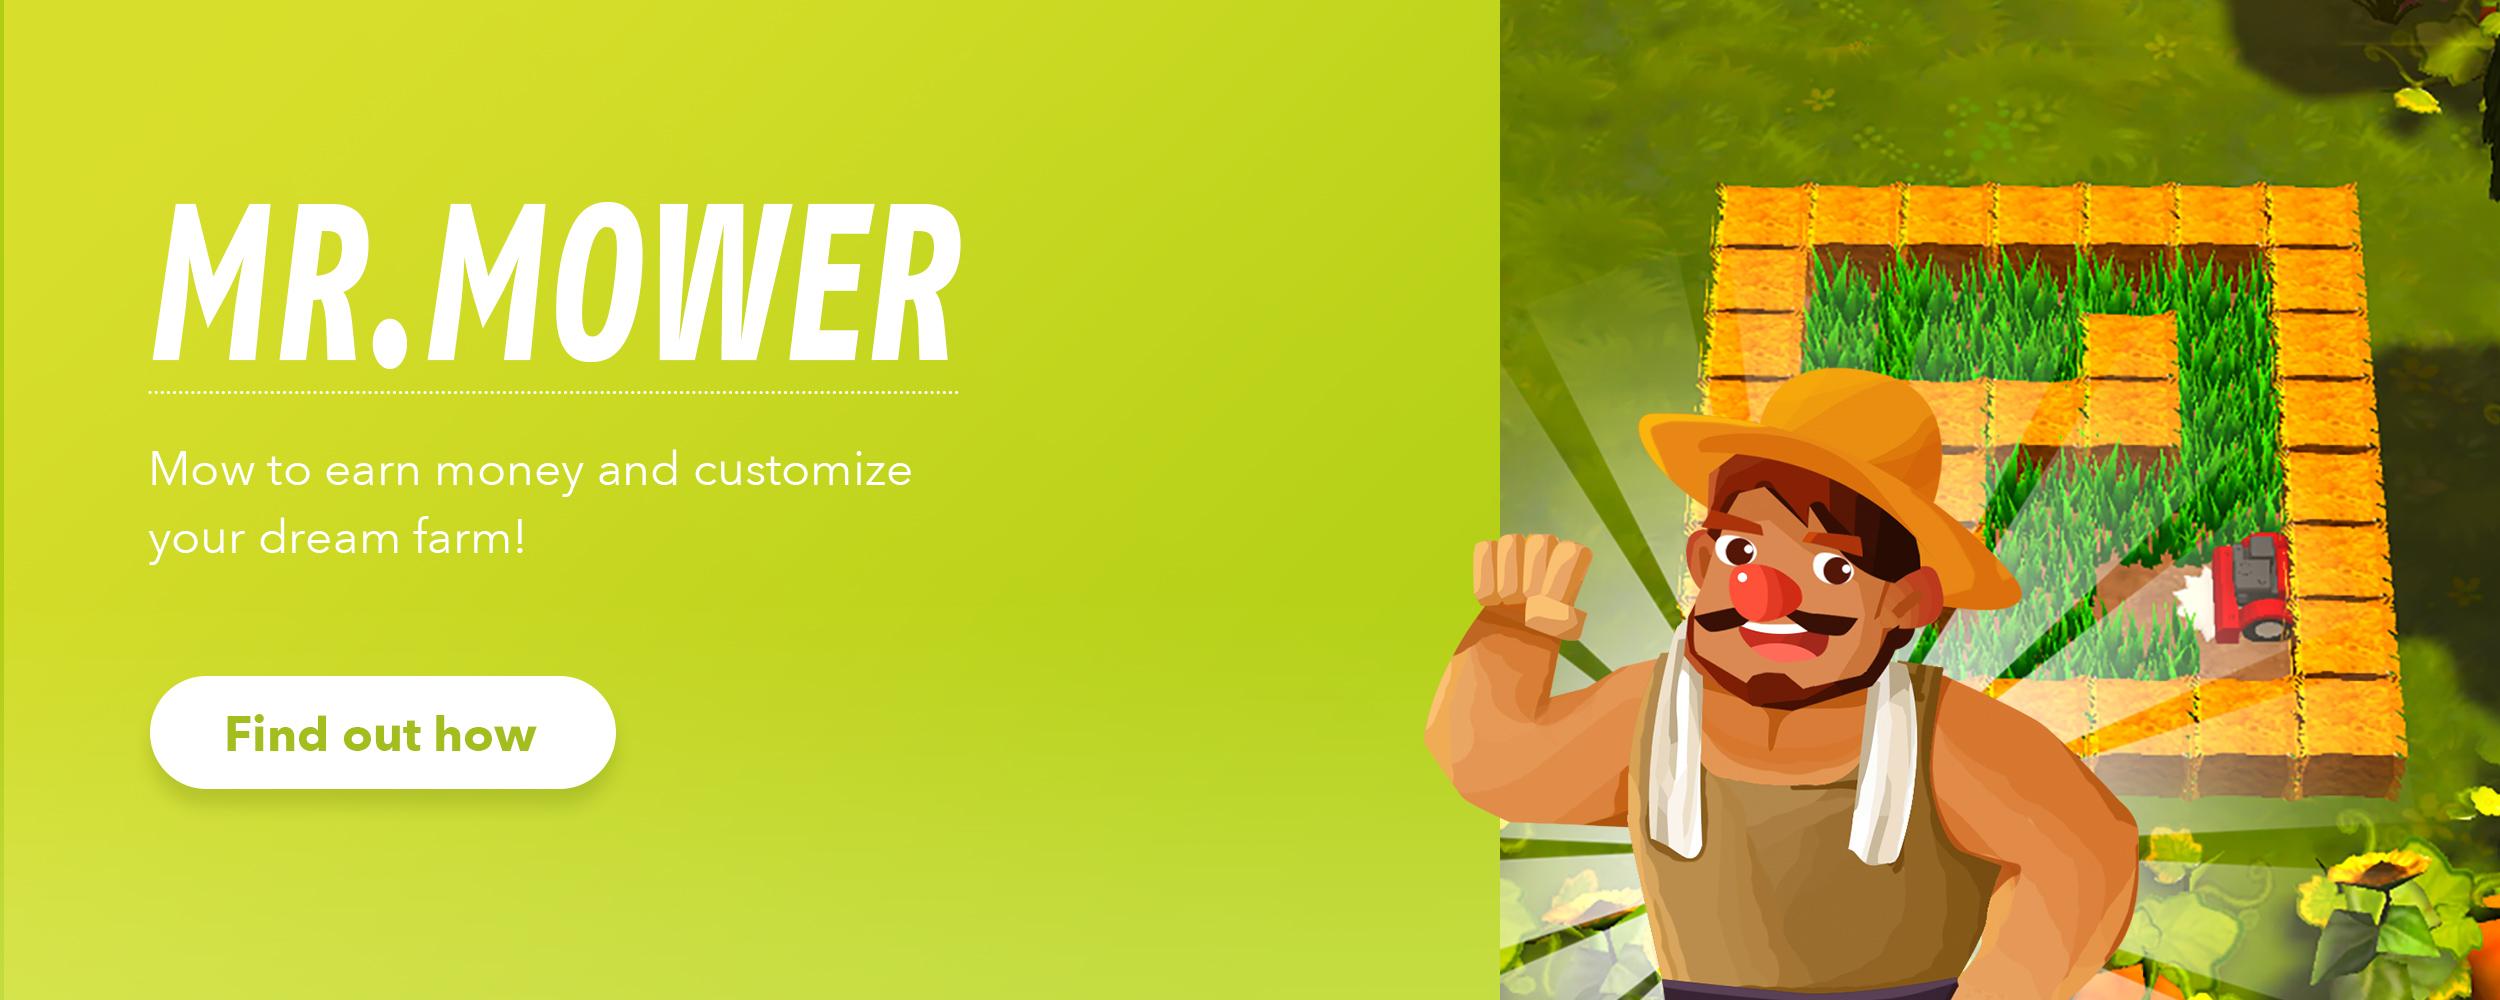 MrMower.jpg